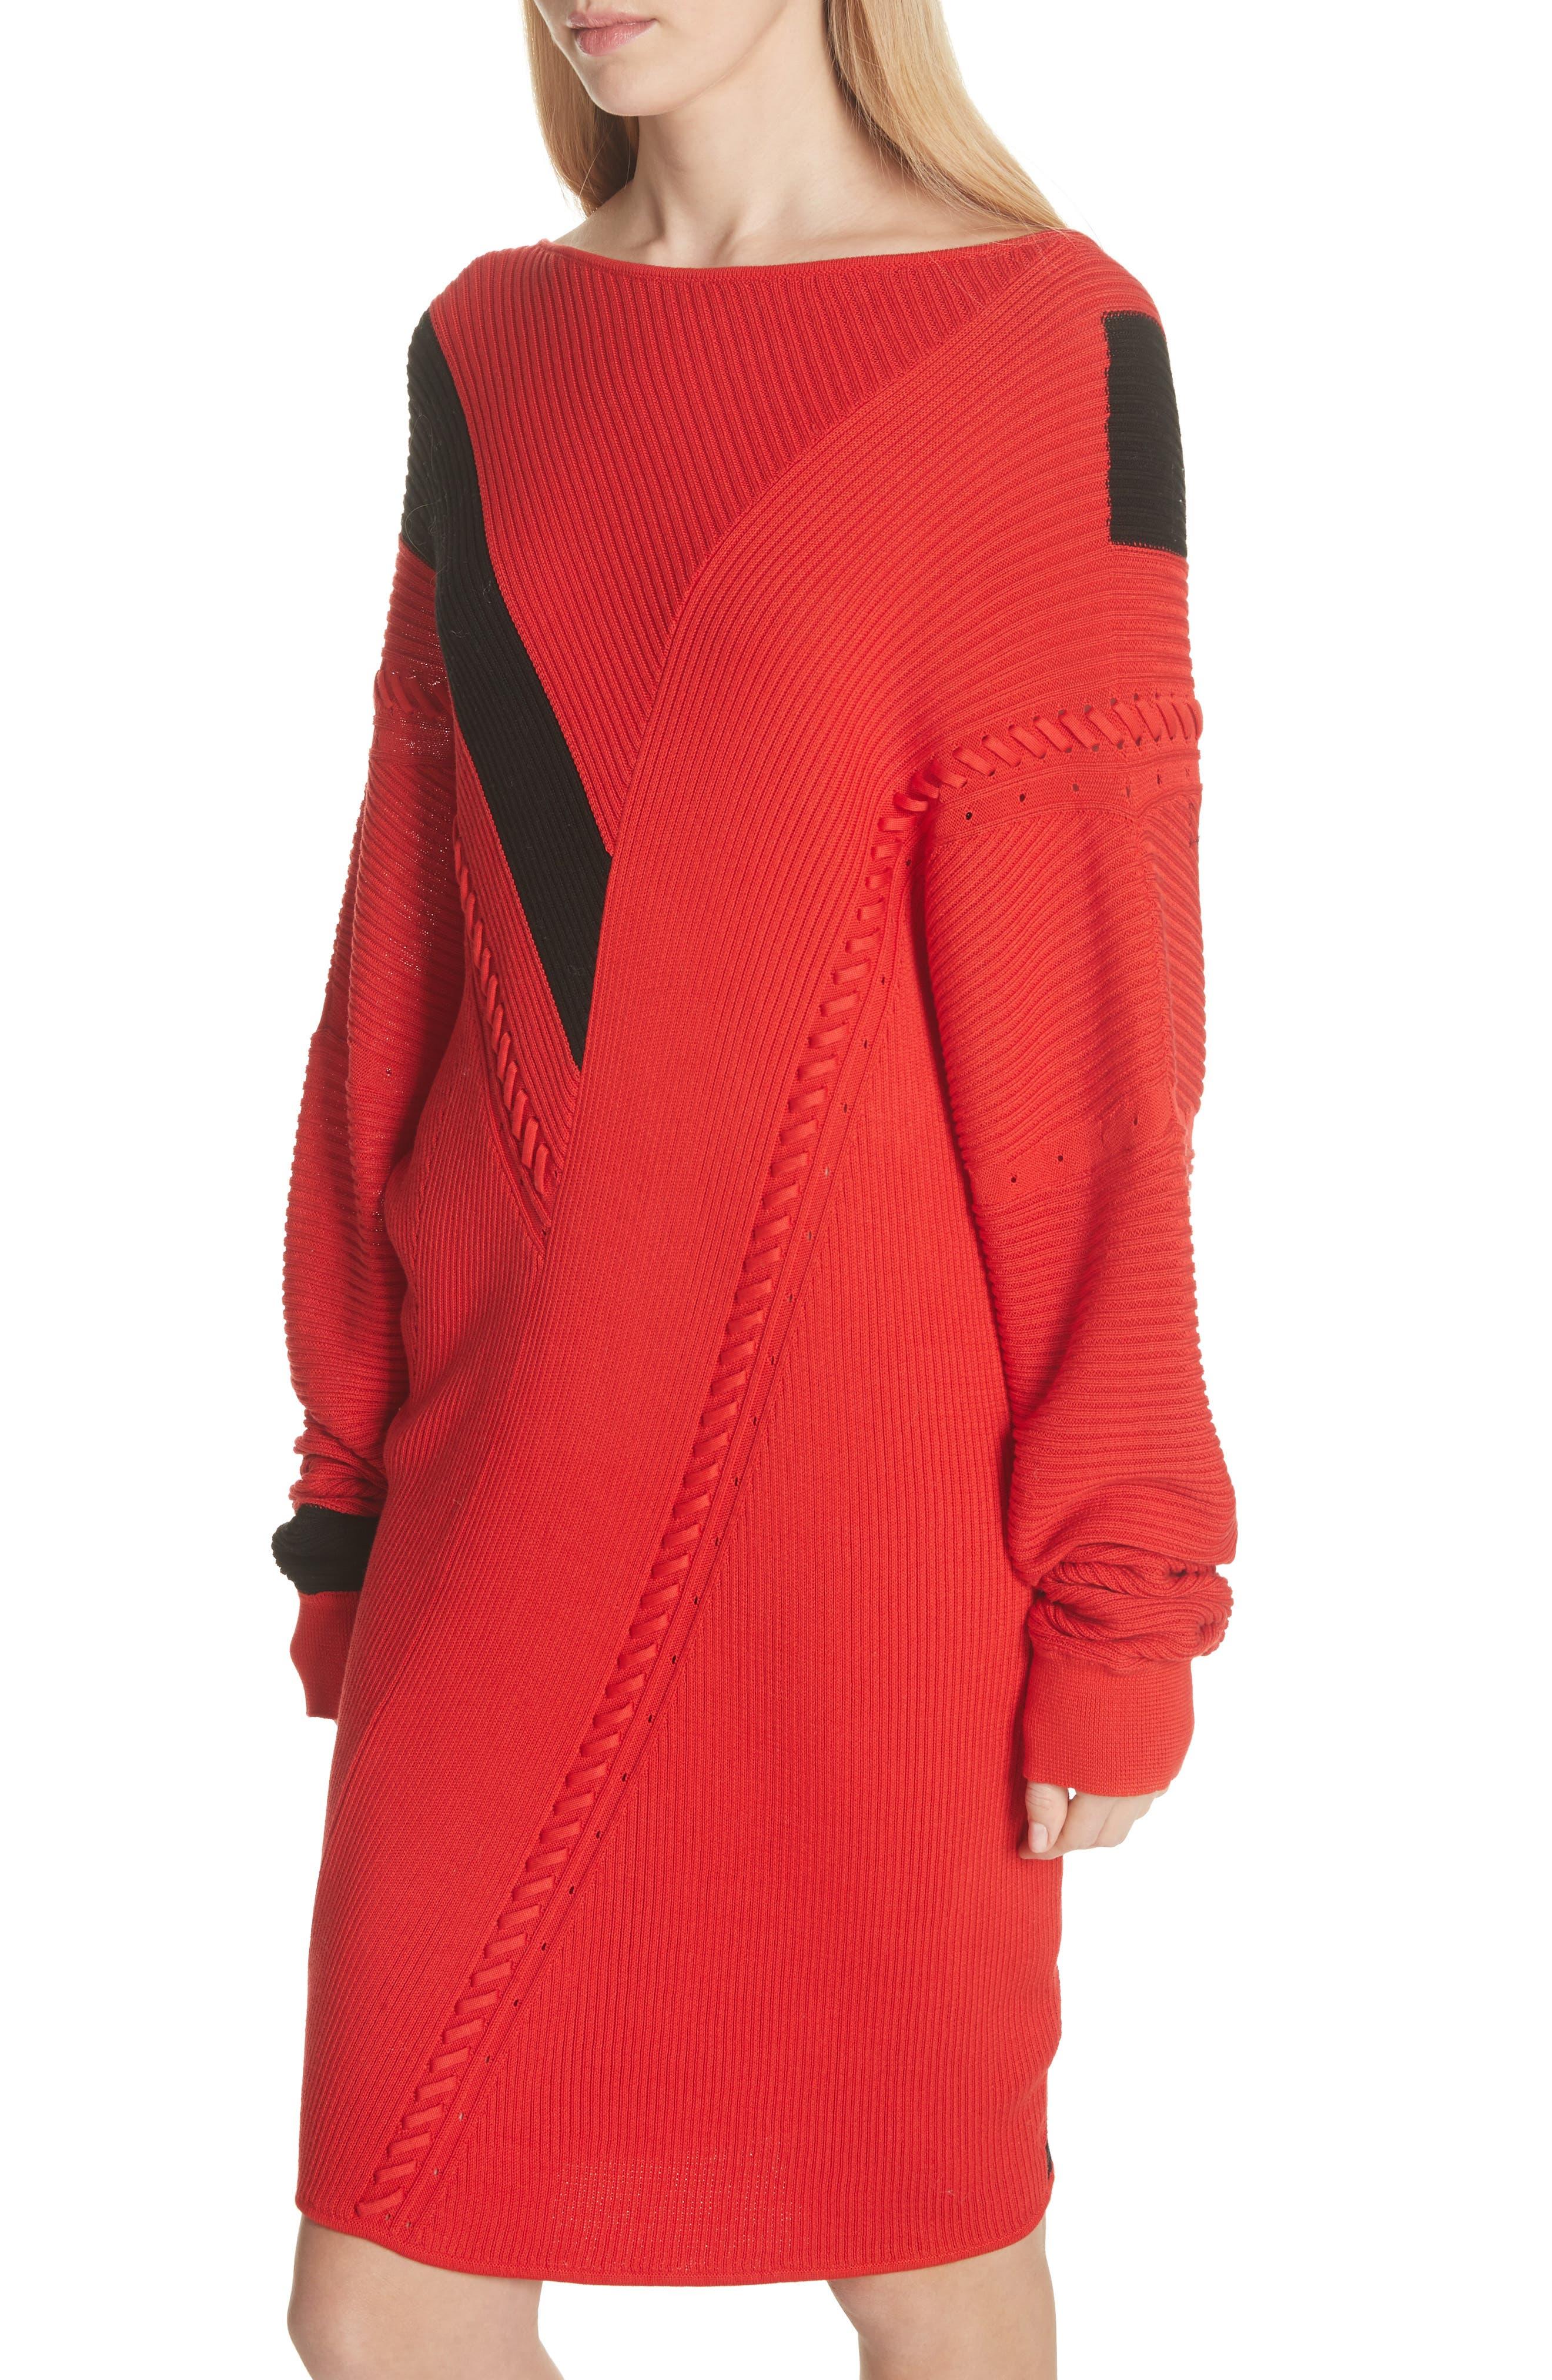 Cricket Reversible Sweater Dress,                             Alternate thumbnail 4, color,                             600